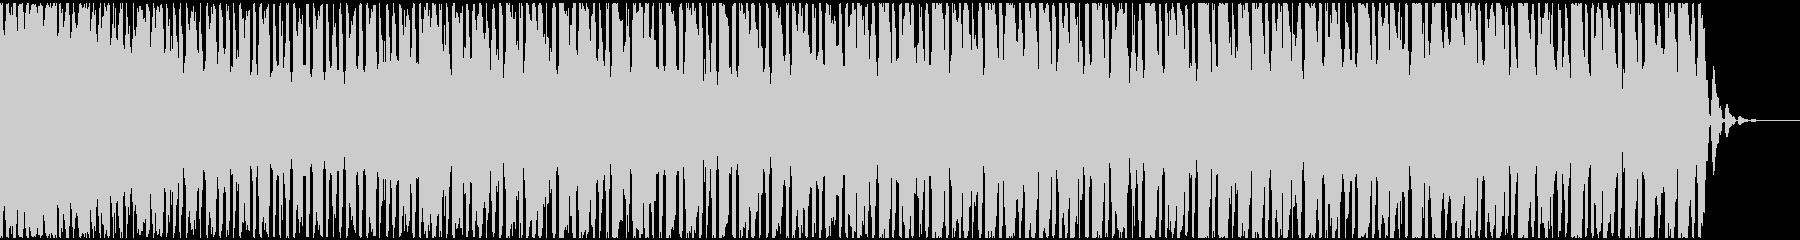 【EDM】トランス、ミディアム1の未再生の波形